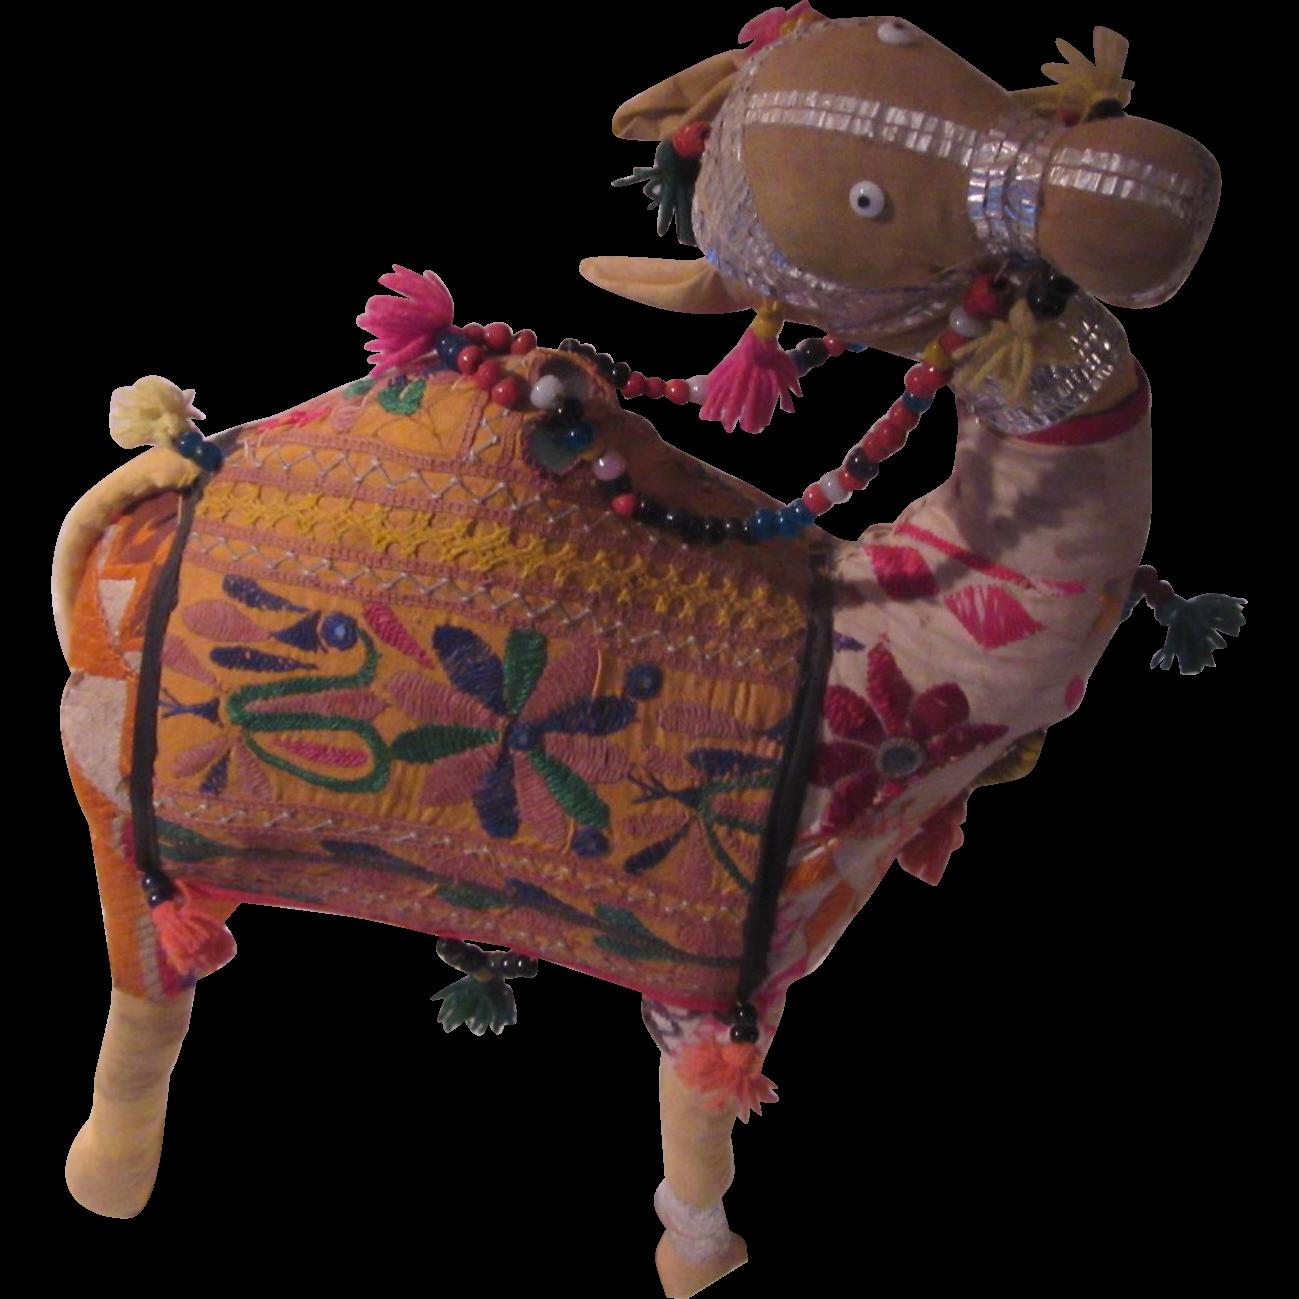 Textile India or Middle Eastern Animal Embroidered Cotton Shisha Mirrors Handmade Folk Art